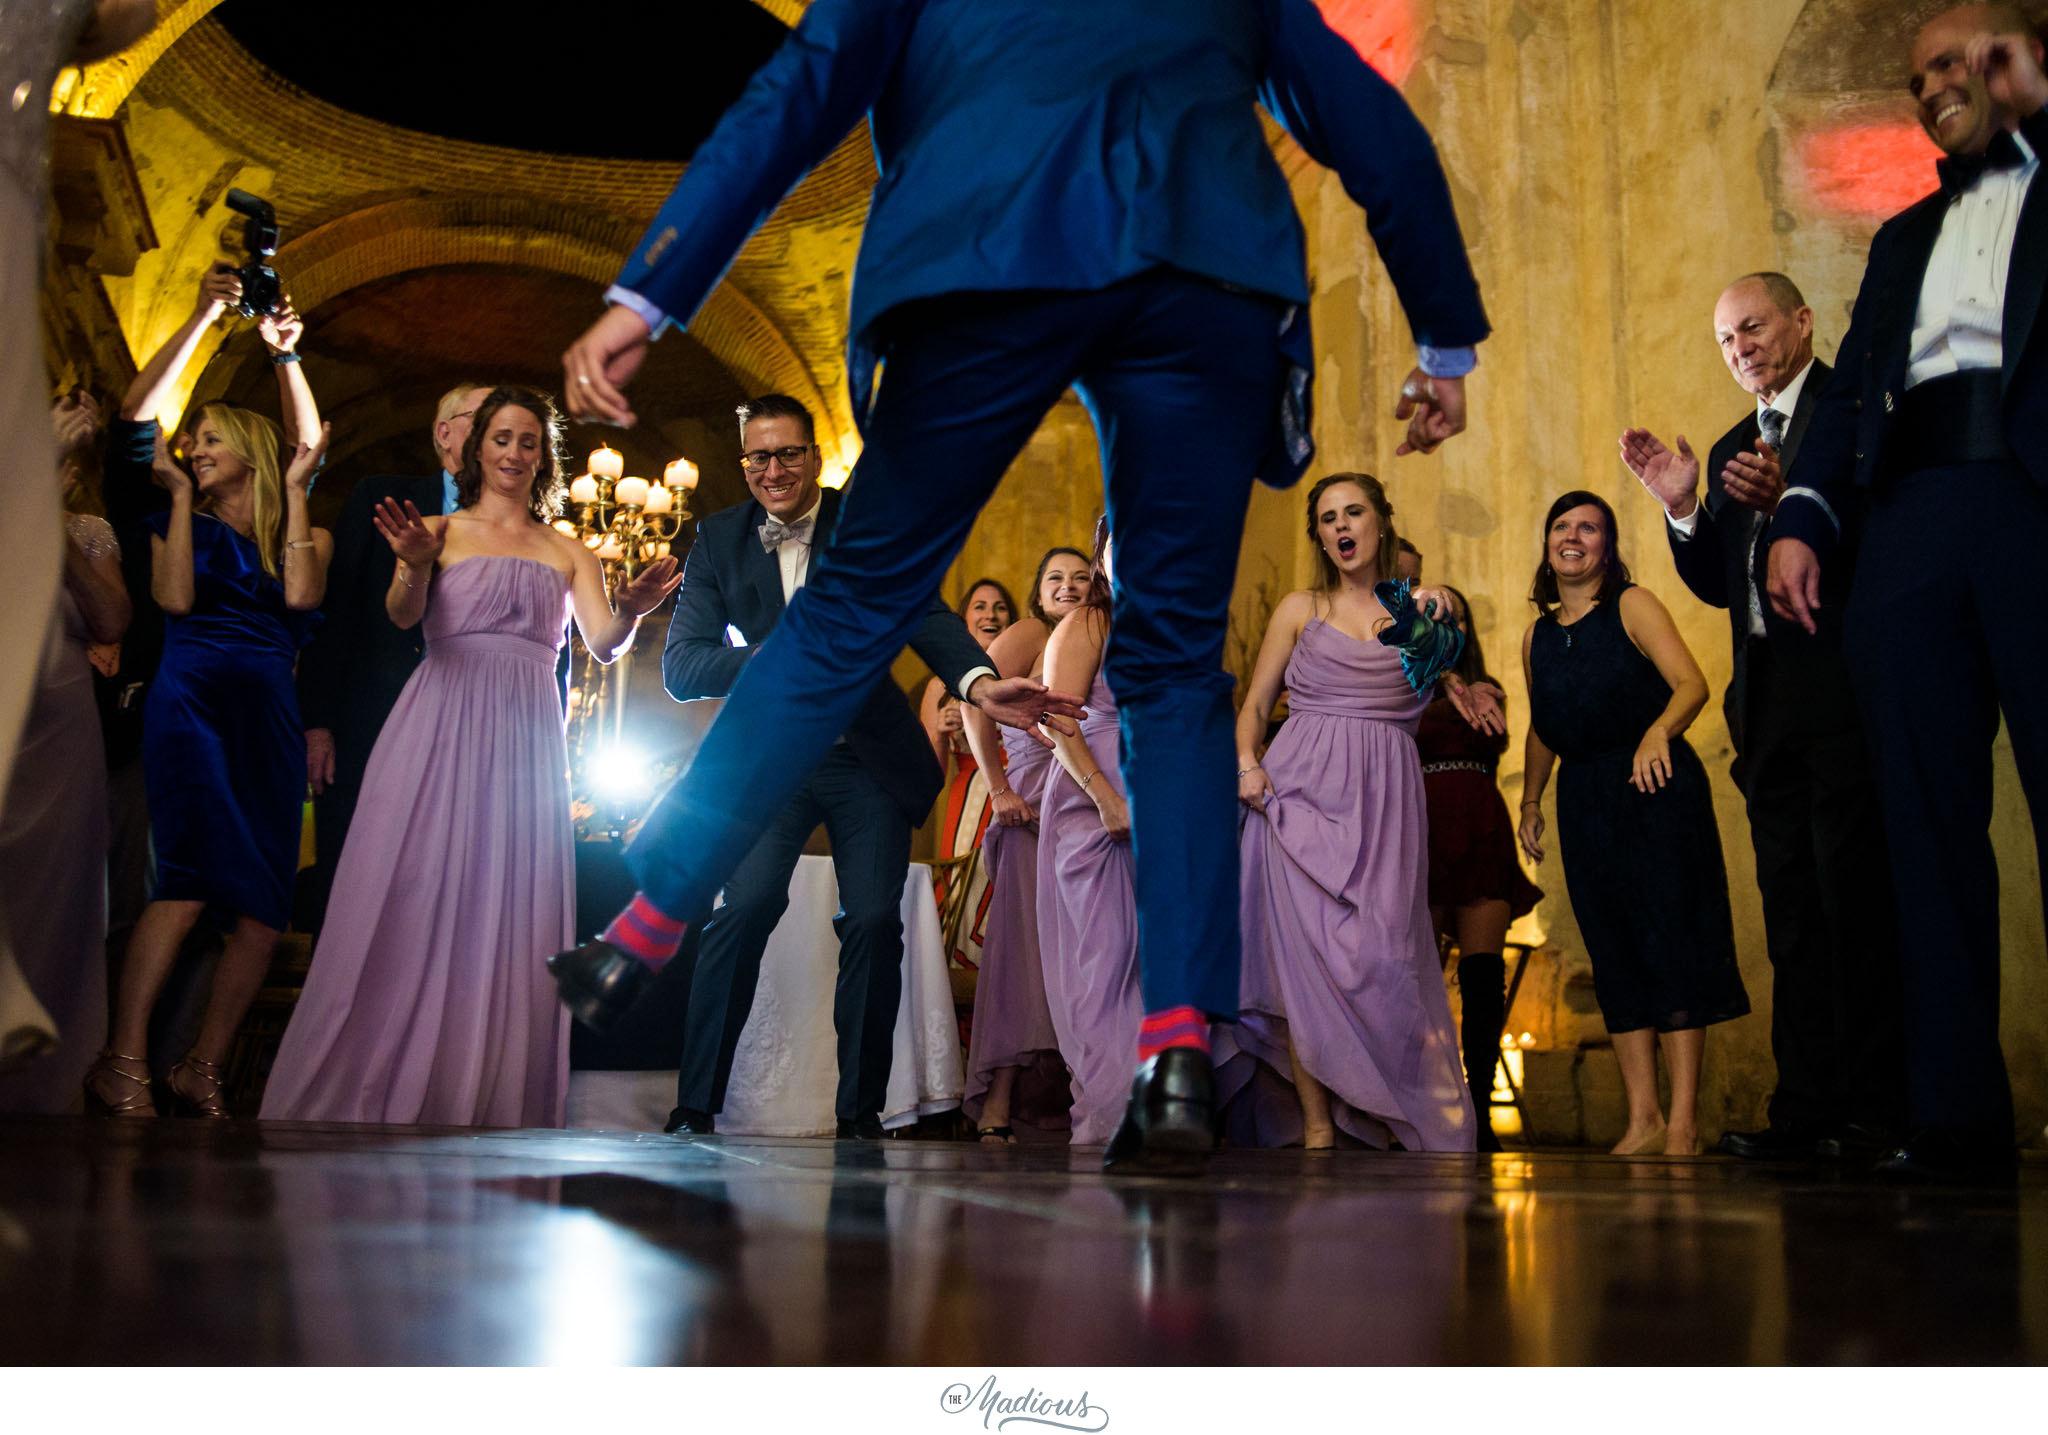 Leigh_Rob_Antigua_Guatemala_Santa_Clara_Destination_Wedding_59.JPG